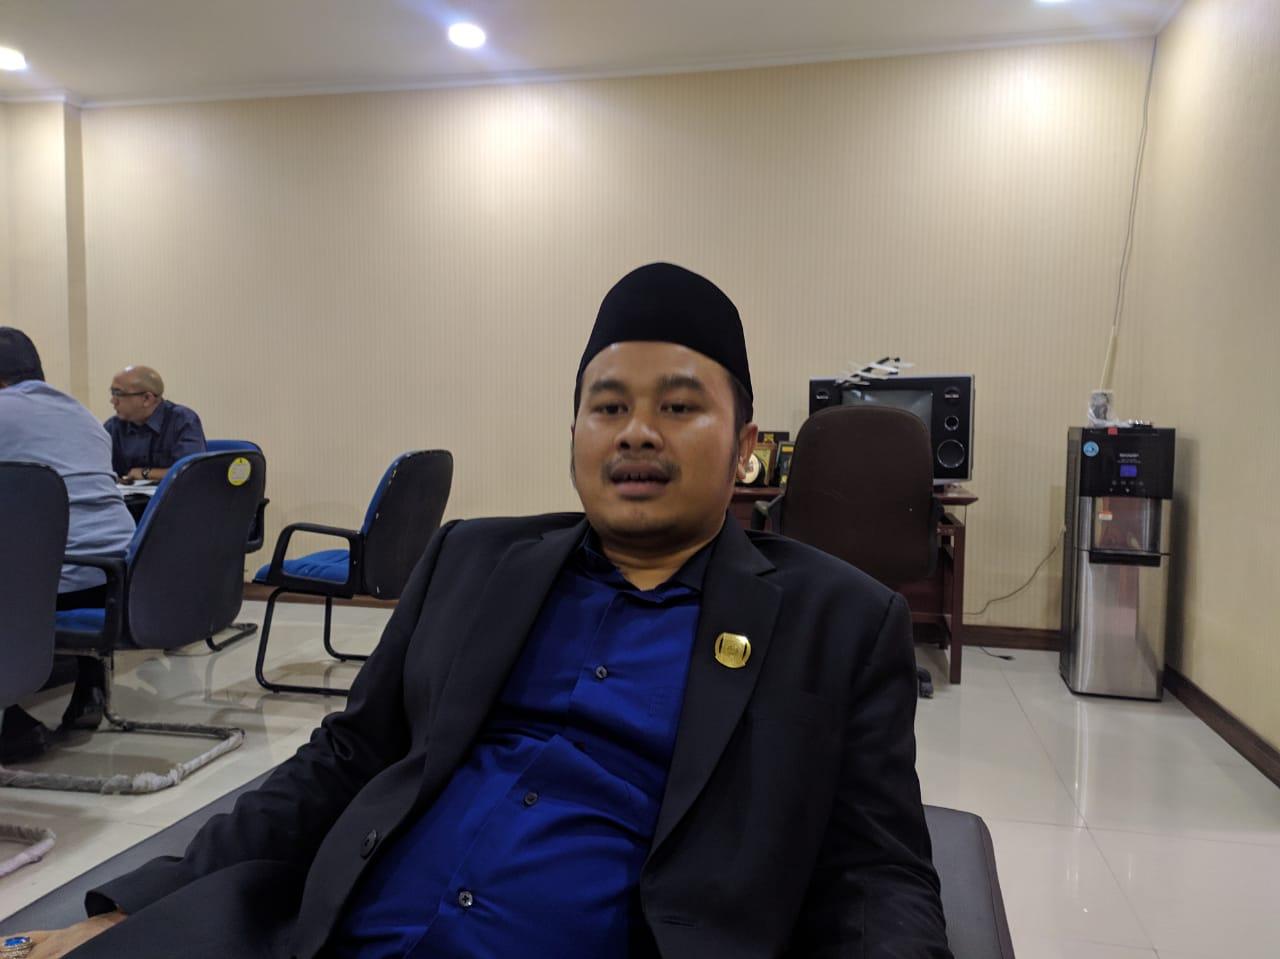 Anggaran Kesehatan Kota Tangerang Cuma 8%, Fraksi NasDem-PSI: Dibawah Standart